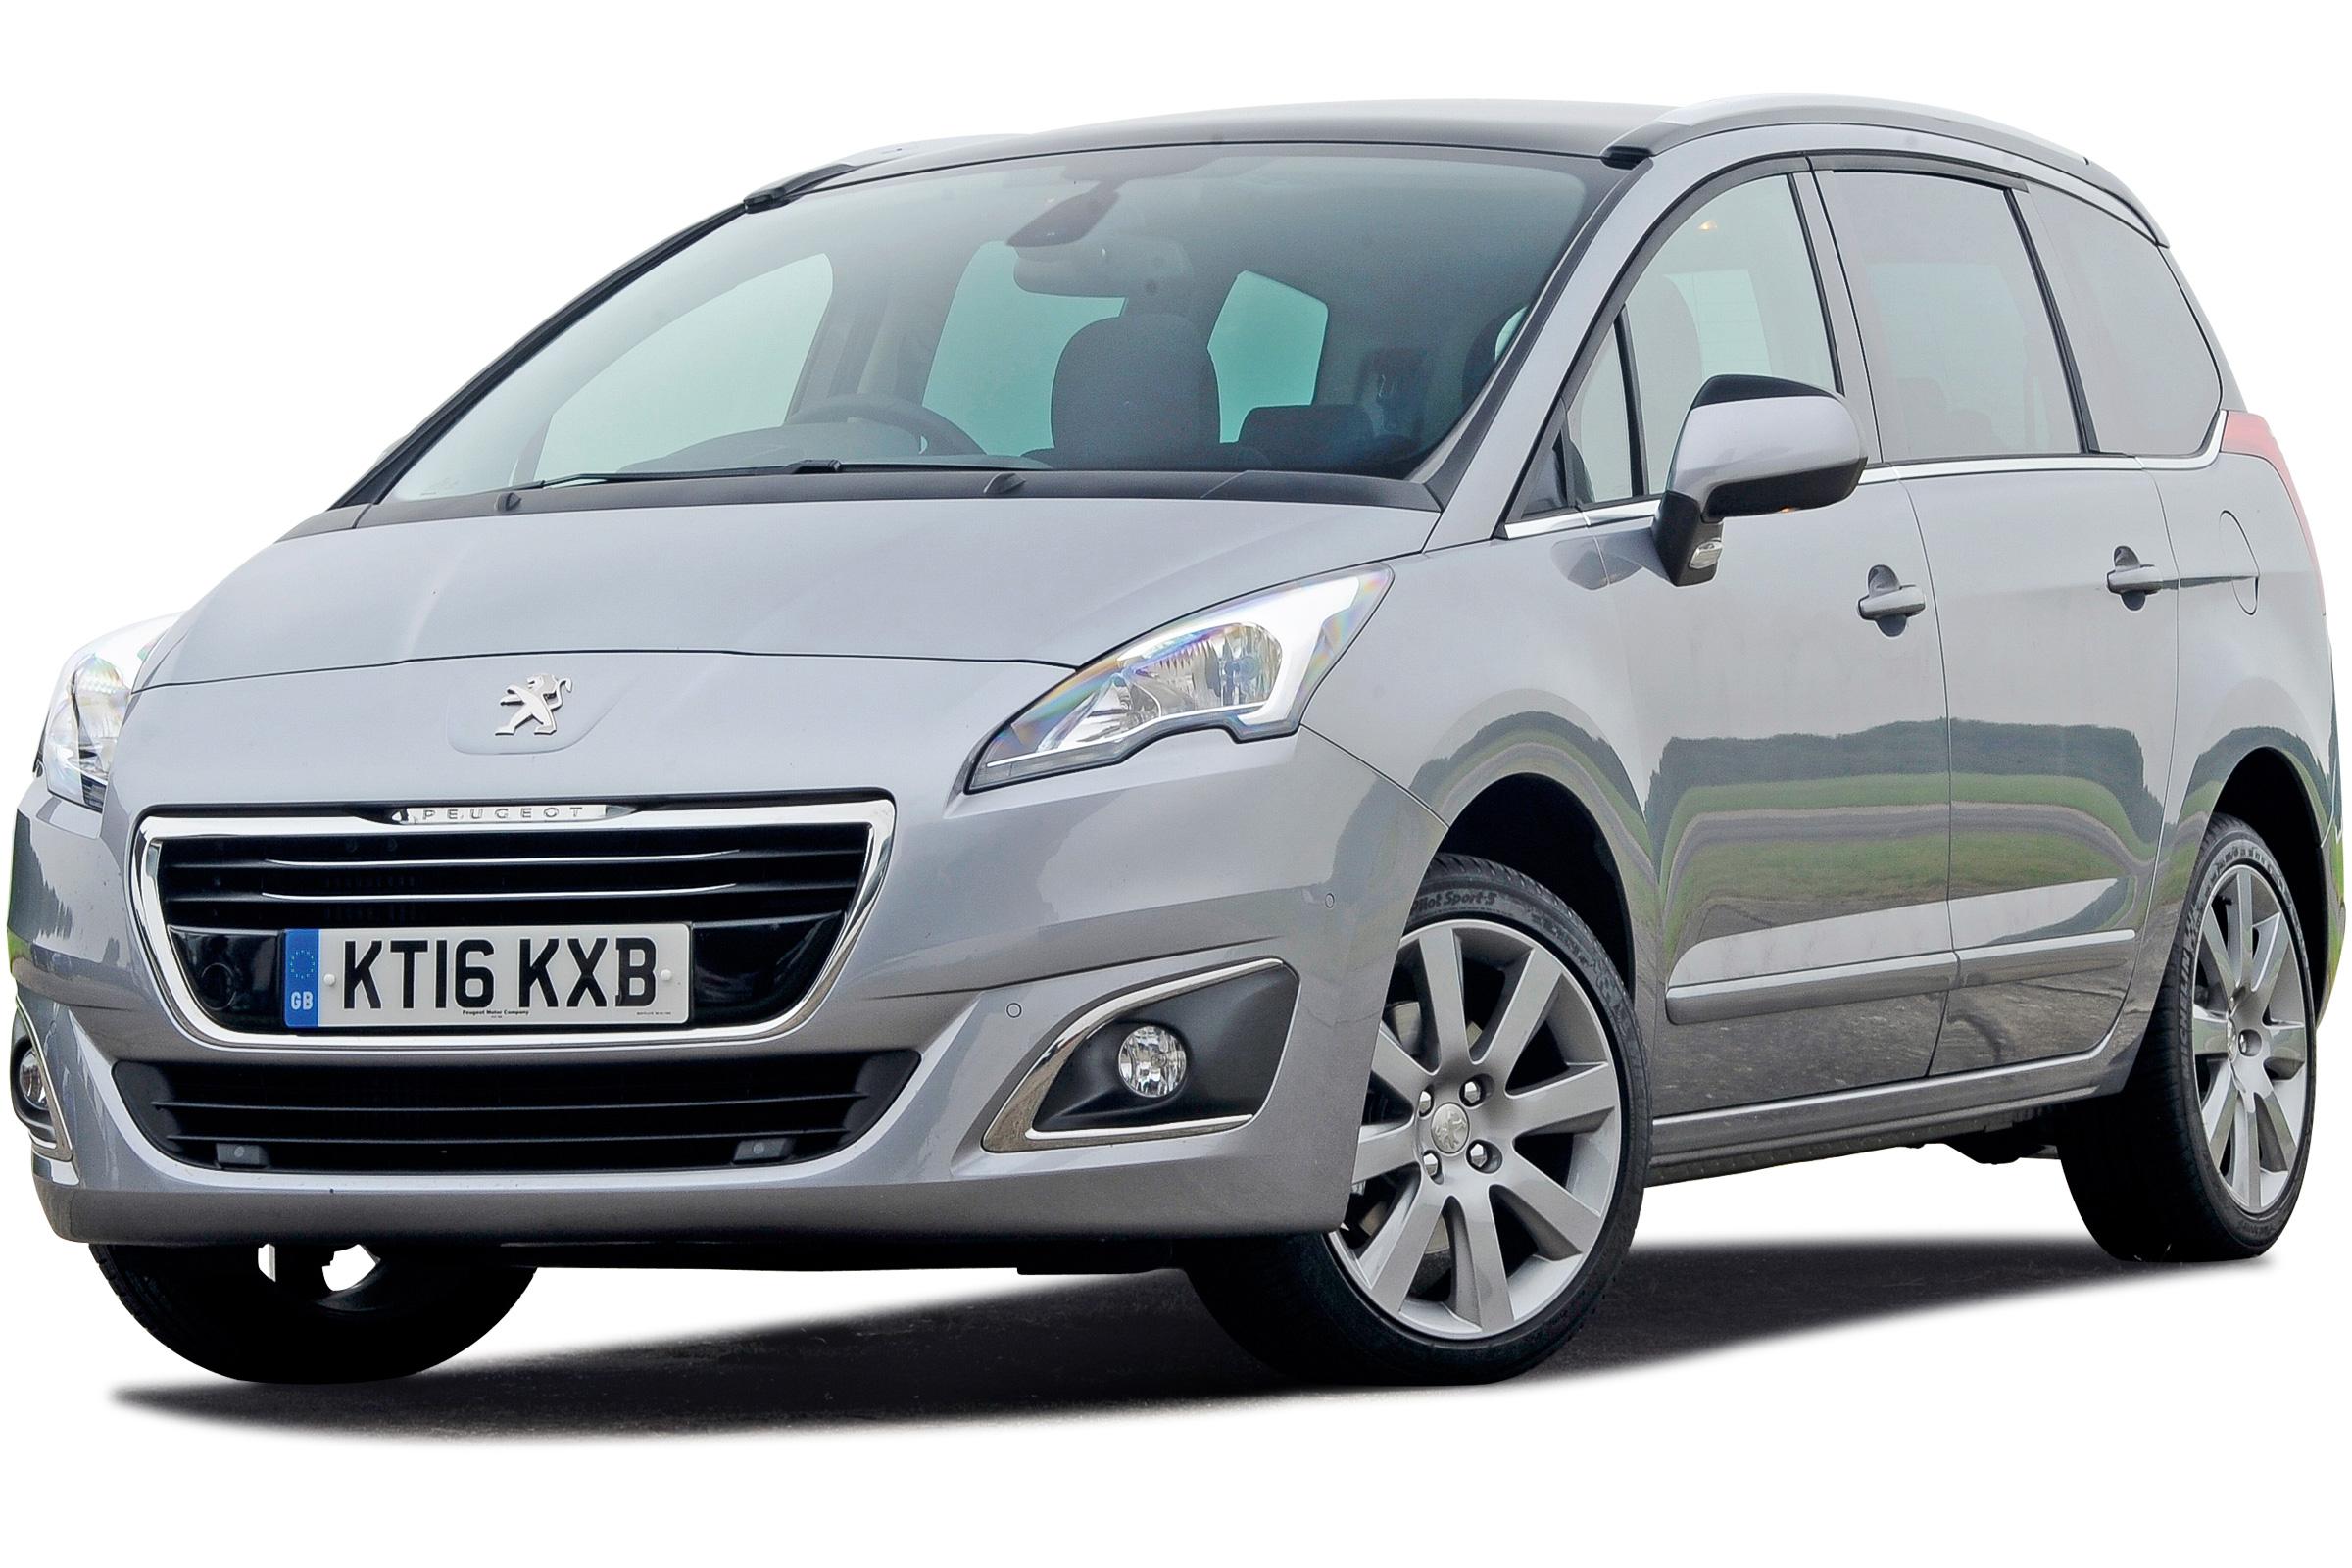 Peugeot 5008 I 2009 - 2013 Compact MPV :: OUTSTANDING CARS